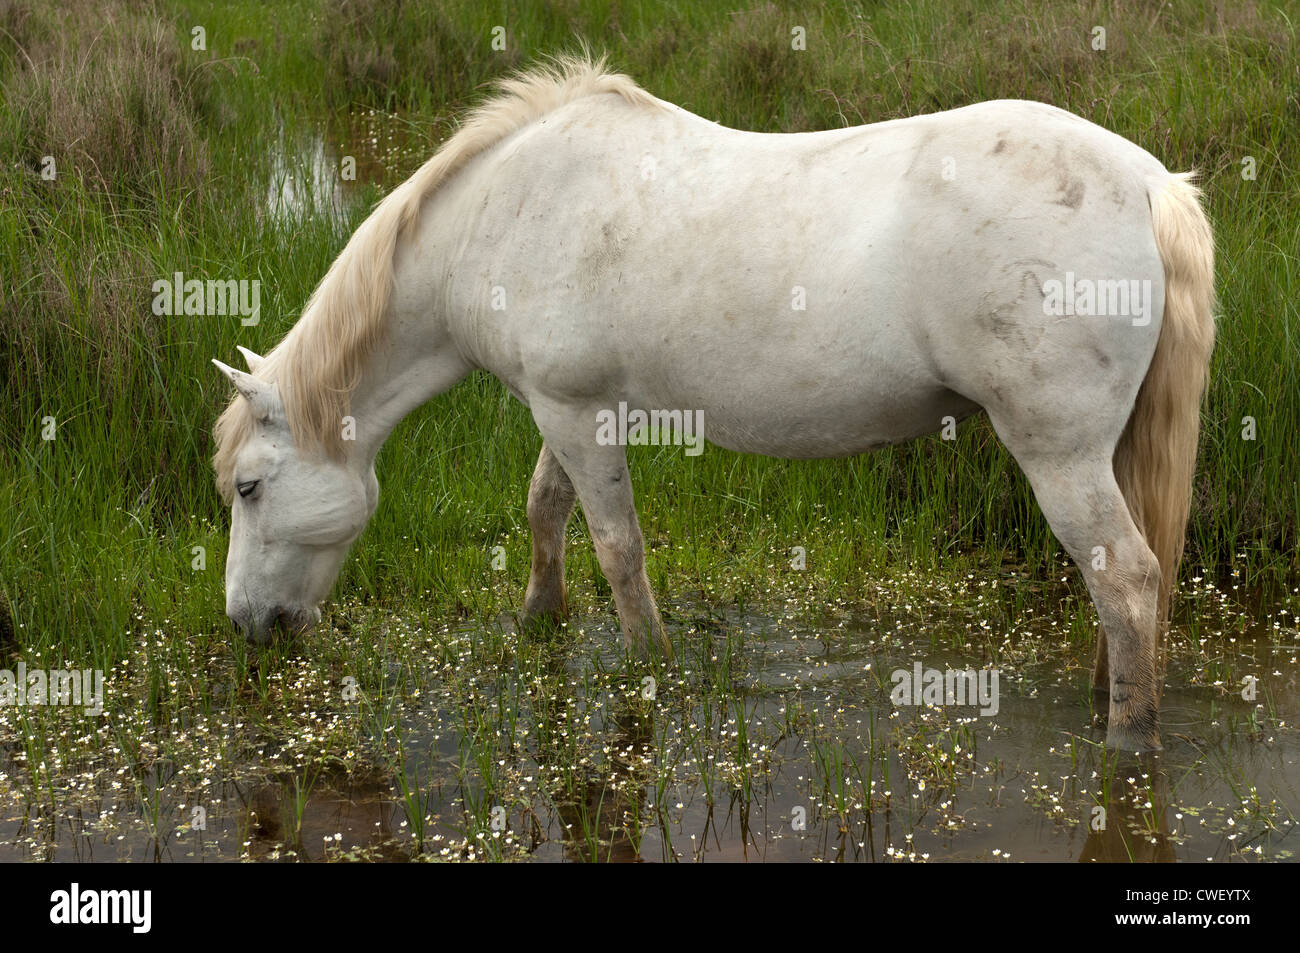 Camargue horse, Camargue, France - Stock Image